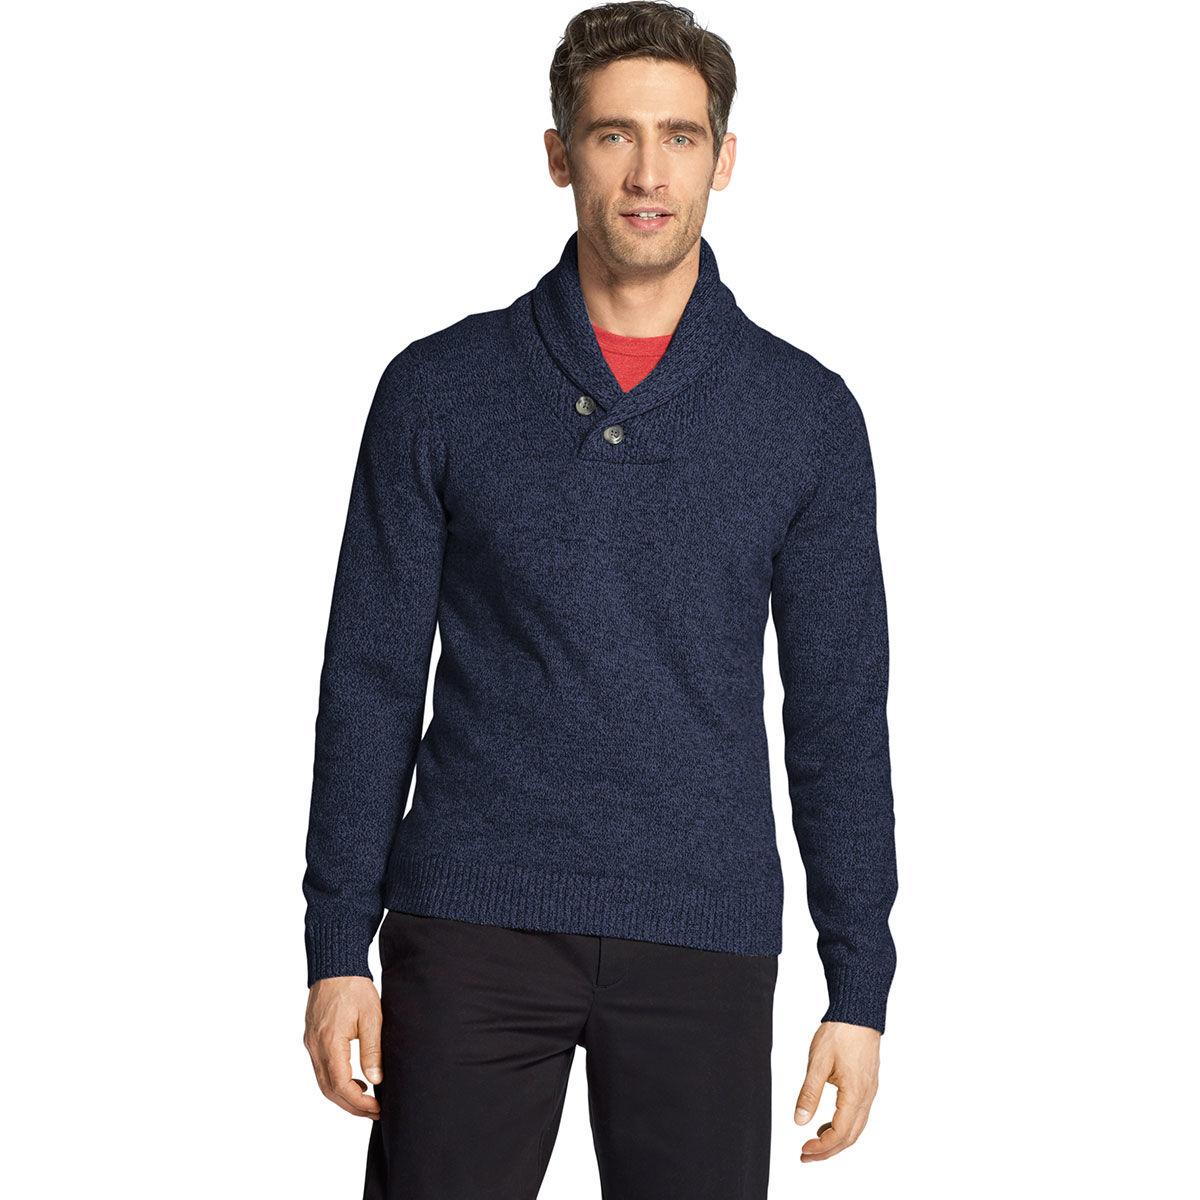 Izod Men's Premium Essentials Shawl Collar Sweater - Blue, XL